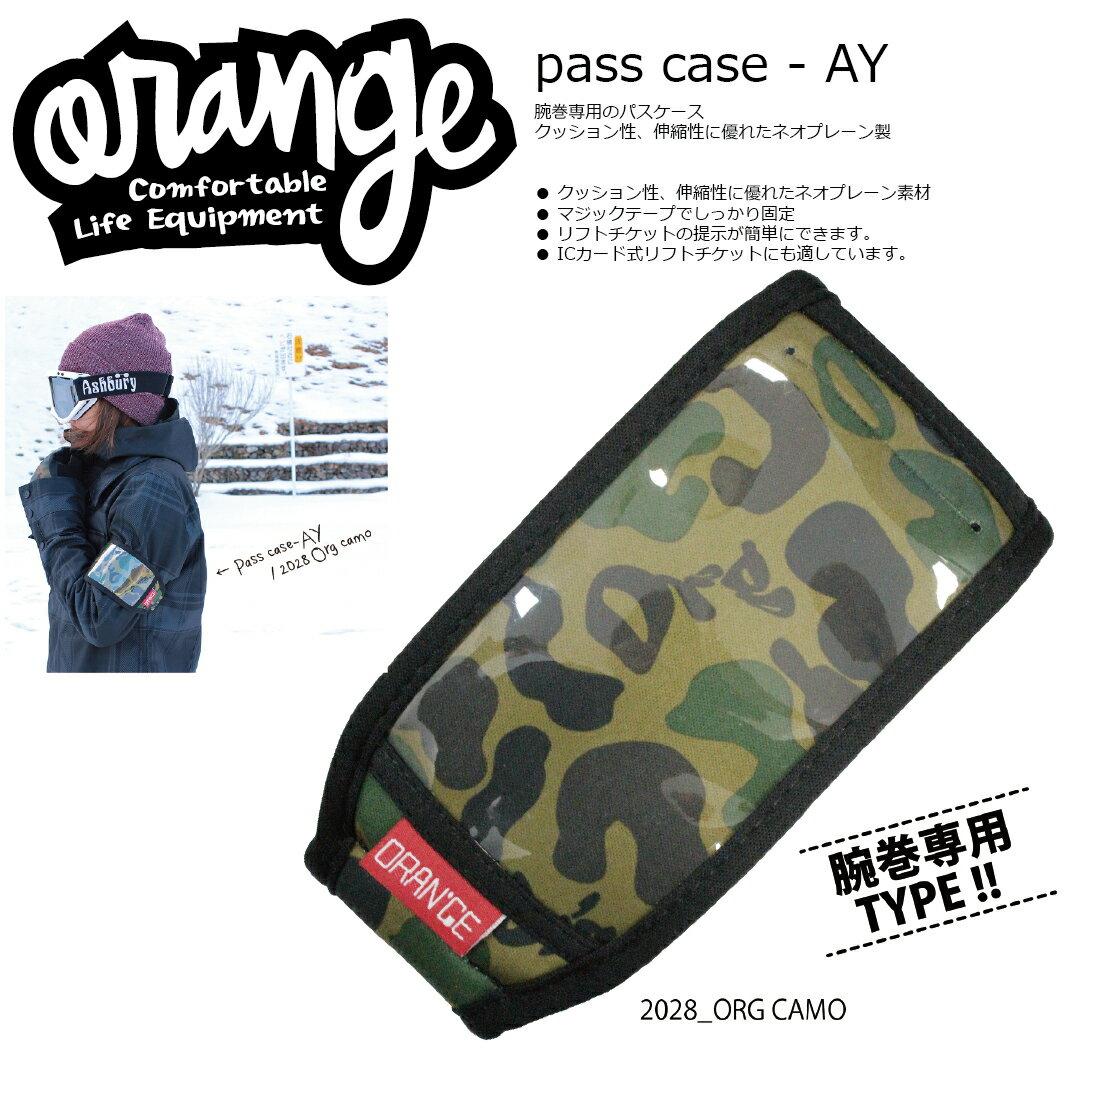 Oran'ge Pass-Case AY 2028 ORG CAMO オレンジ パスケース エーワイ うで装着タイプ ヨコ 2017 2017-18